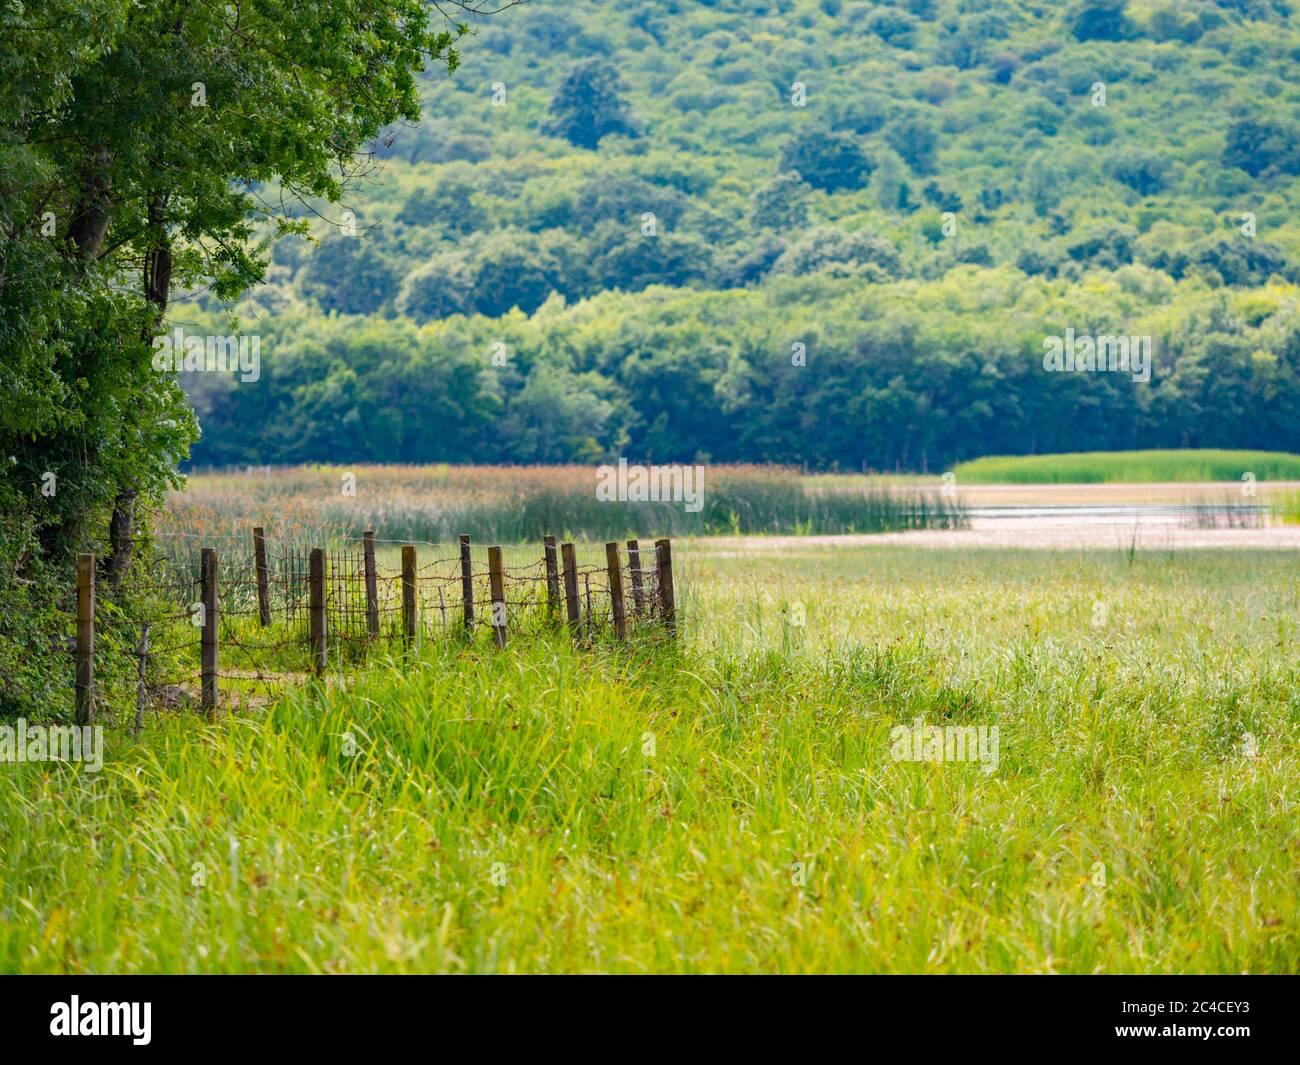 Swampy lake near fence Ponikve island Krk Croatia Europe Stock Photo